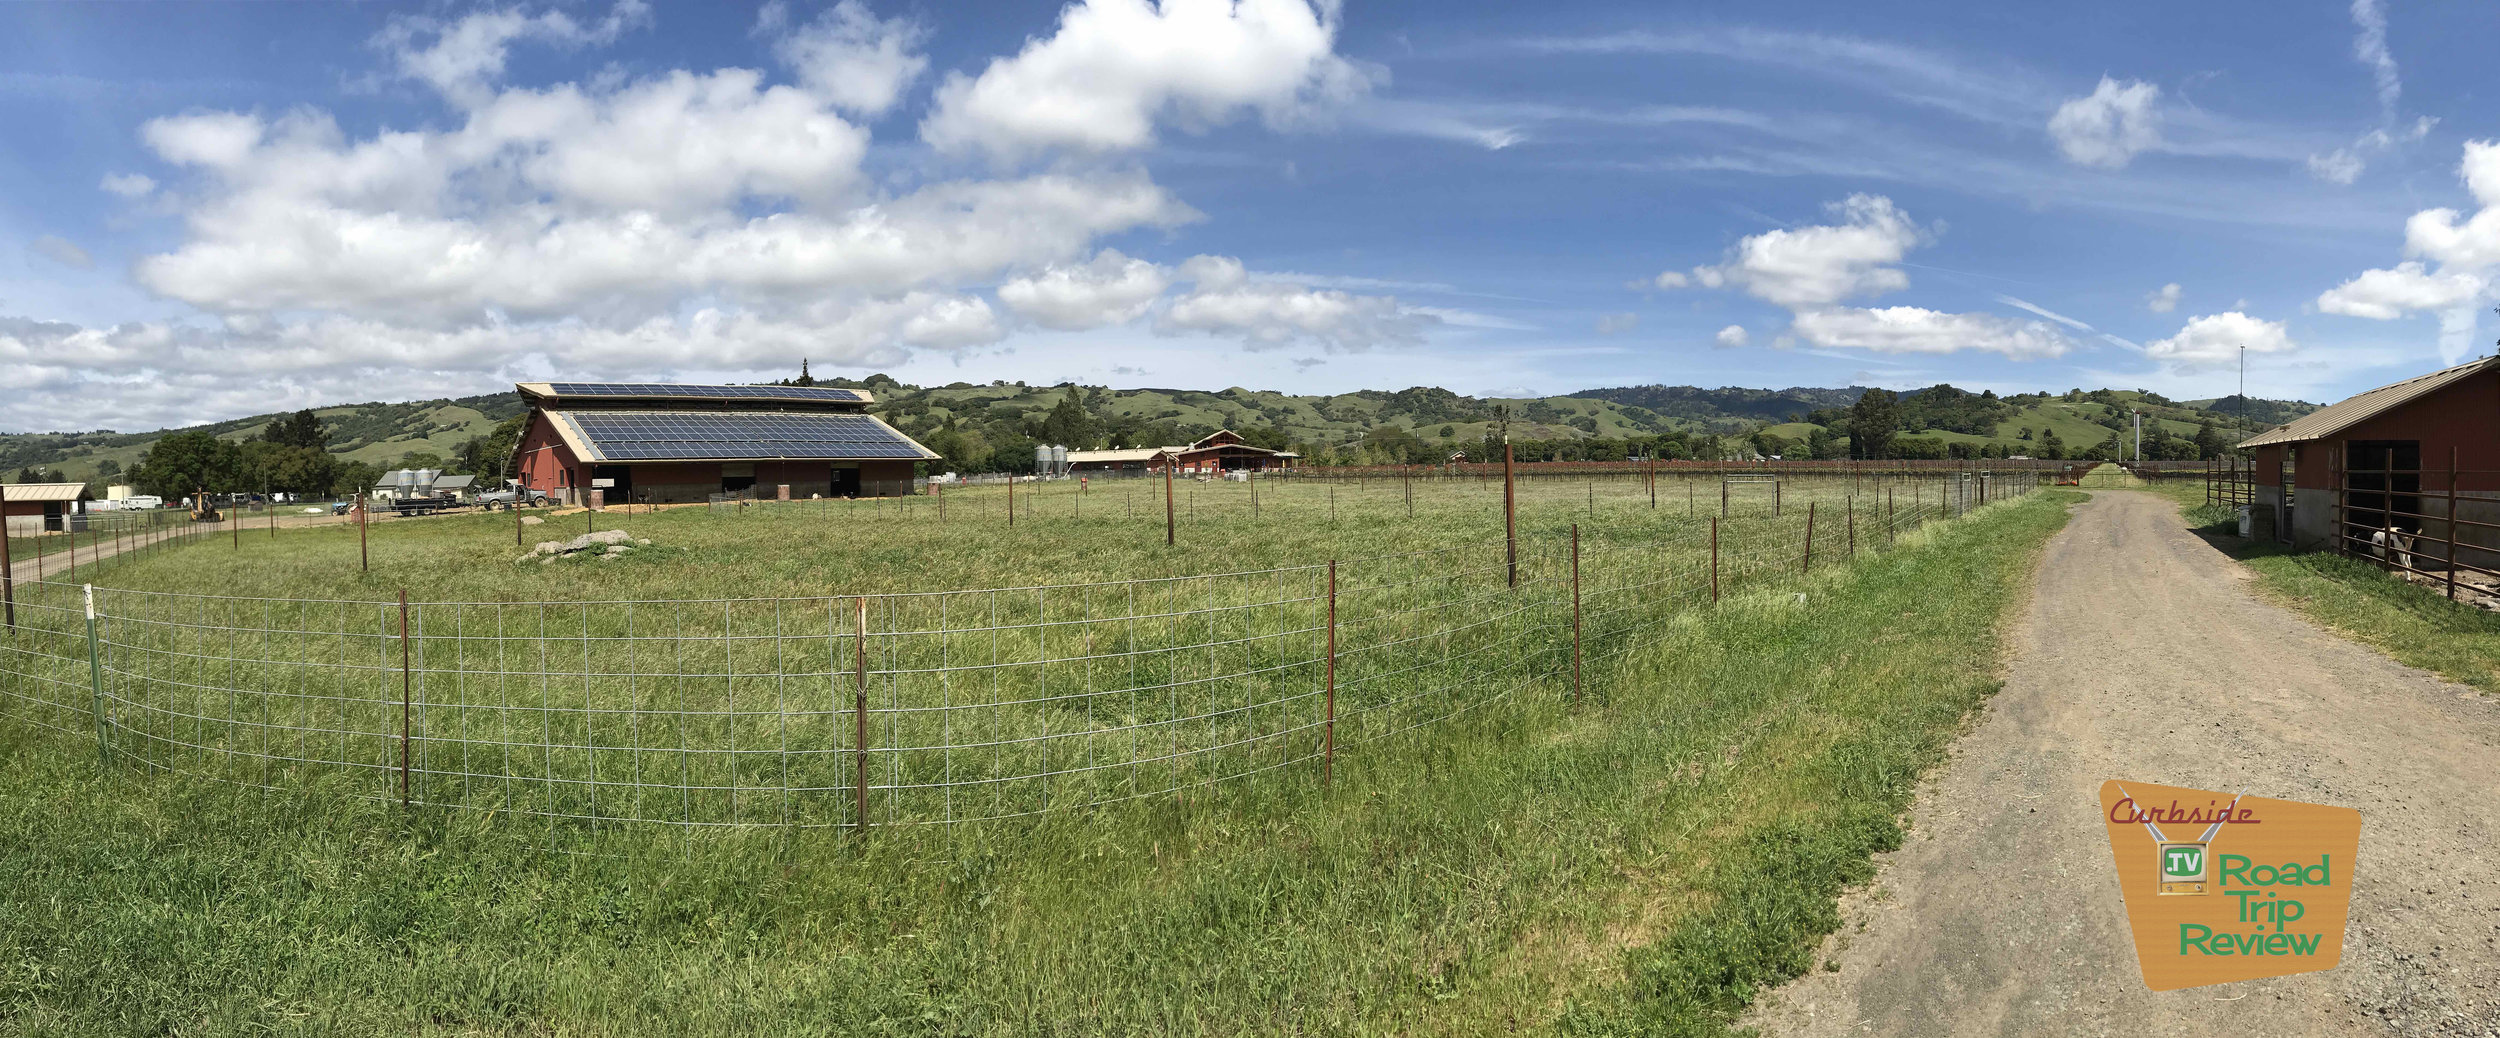 Anderson Valley - 14.jpg